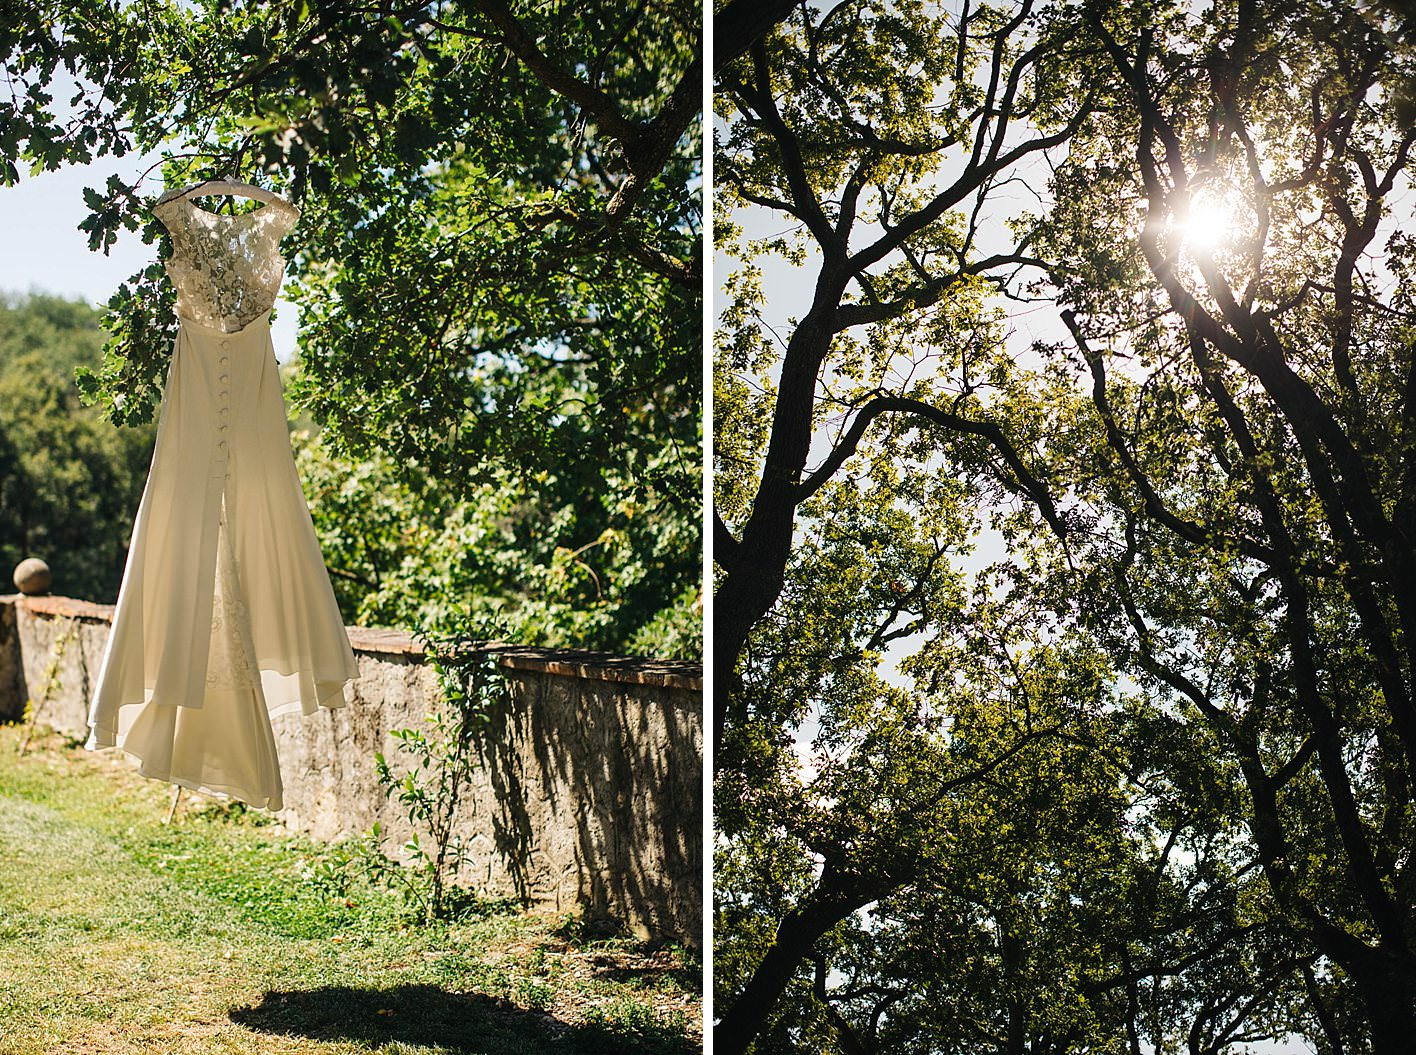 rime arodaky wedding dress hanging from tree